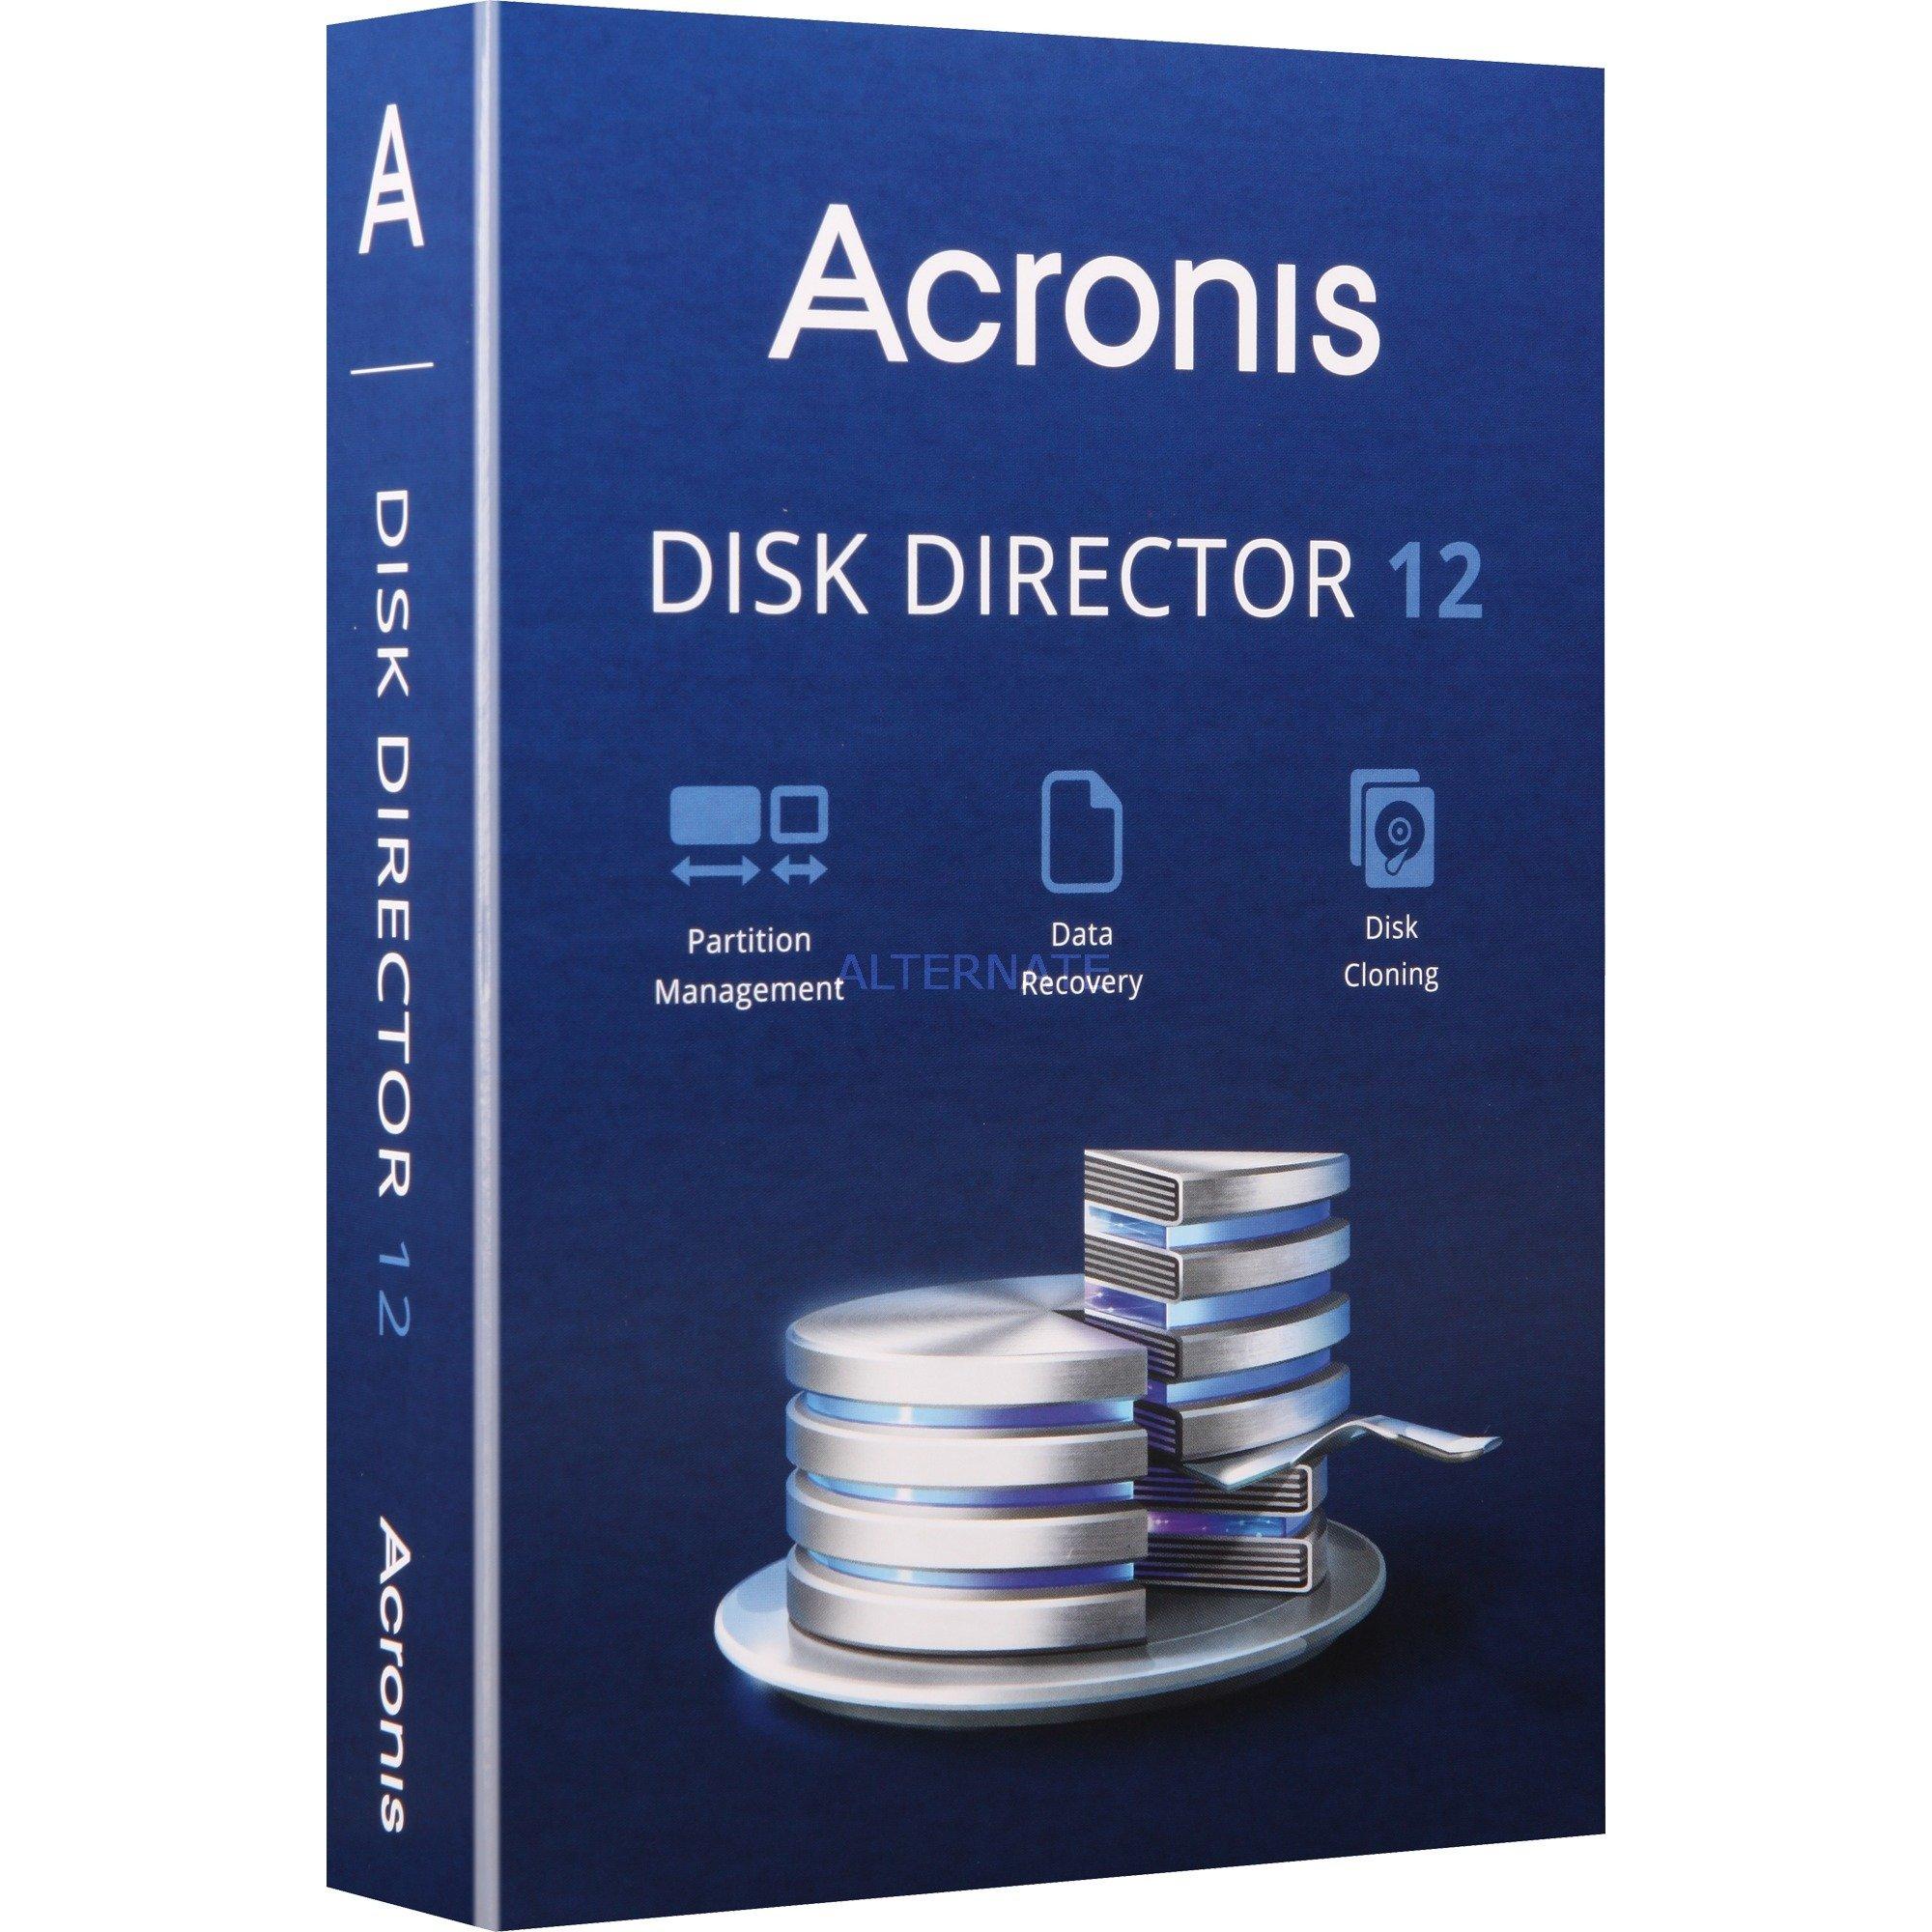 Disk Director 12.0, Software